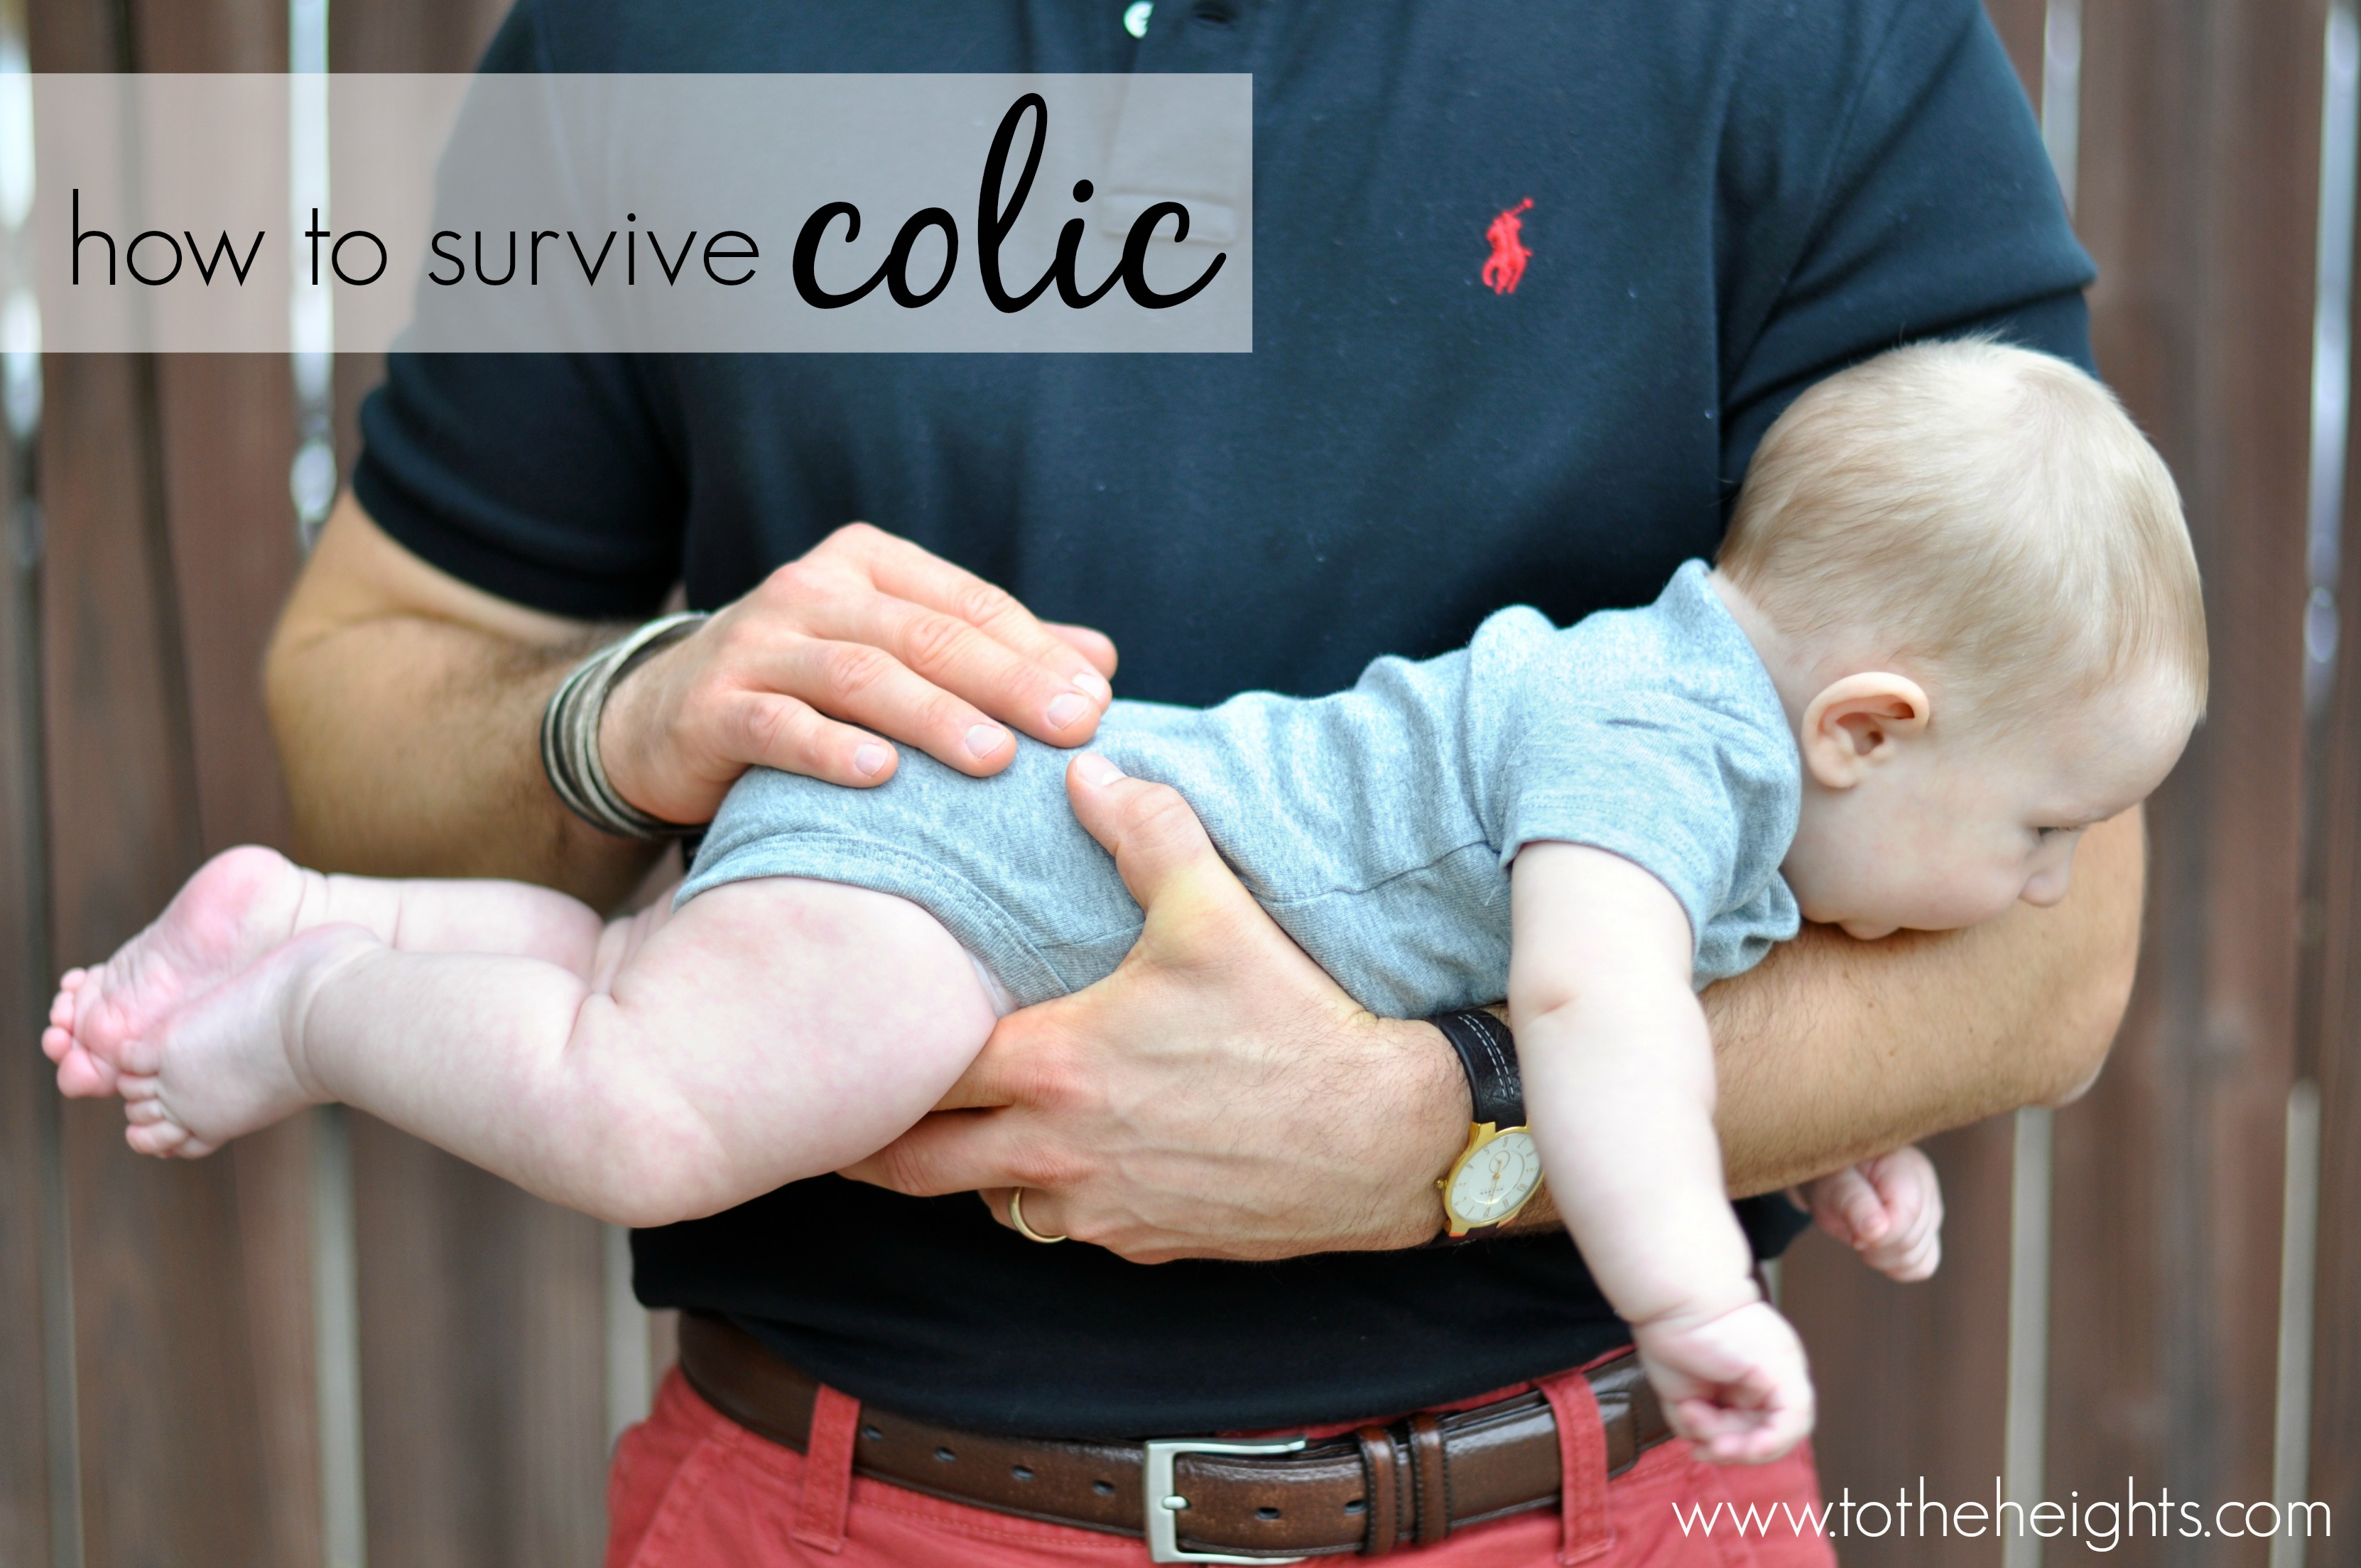 survive-colic